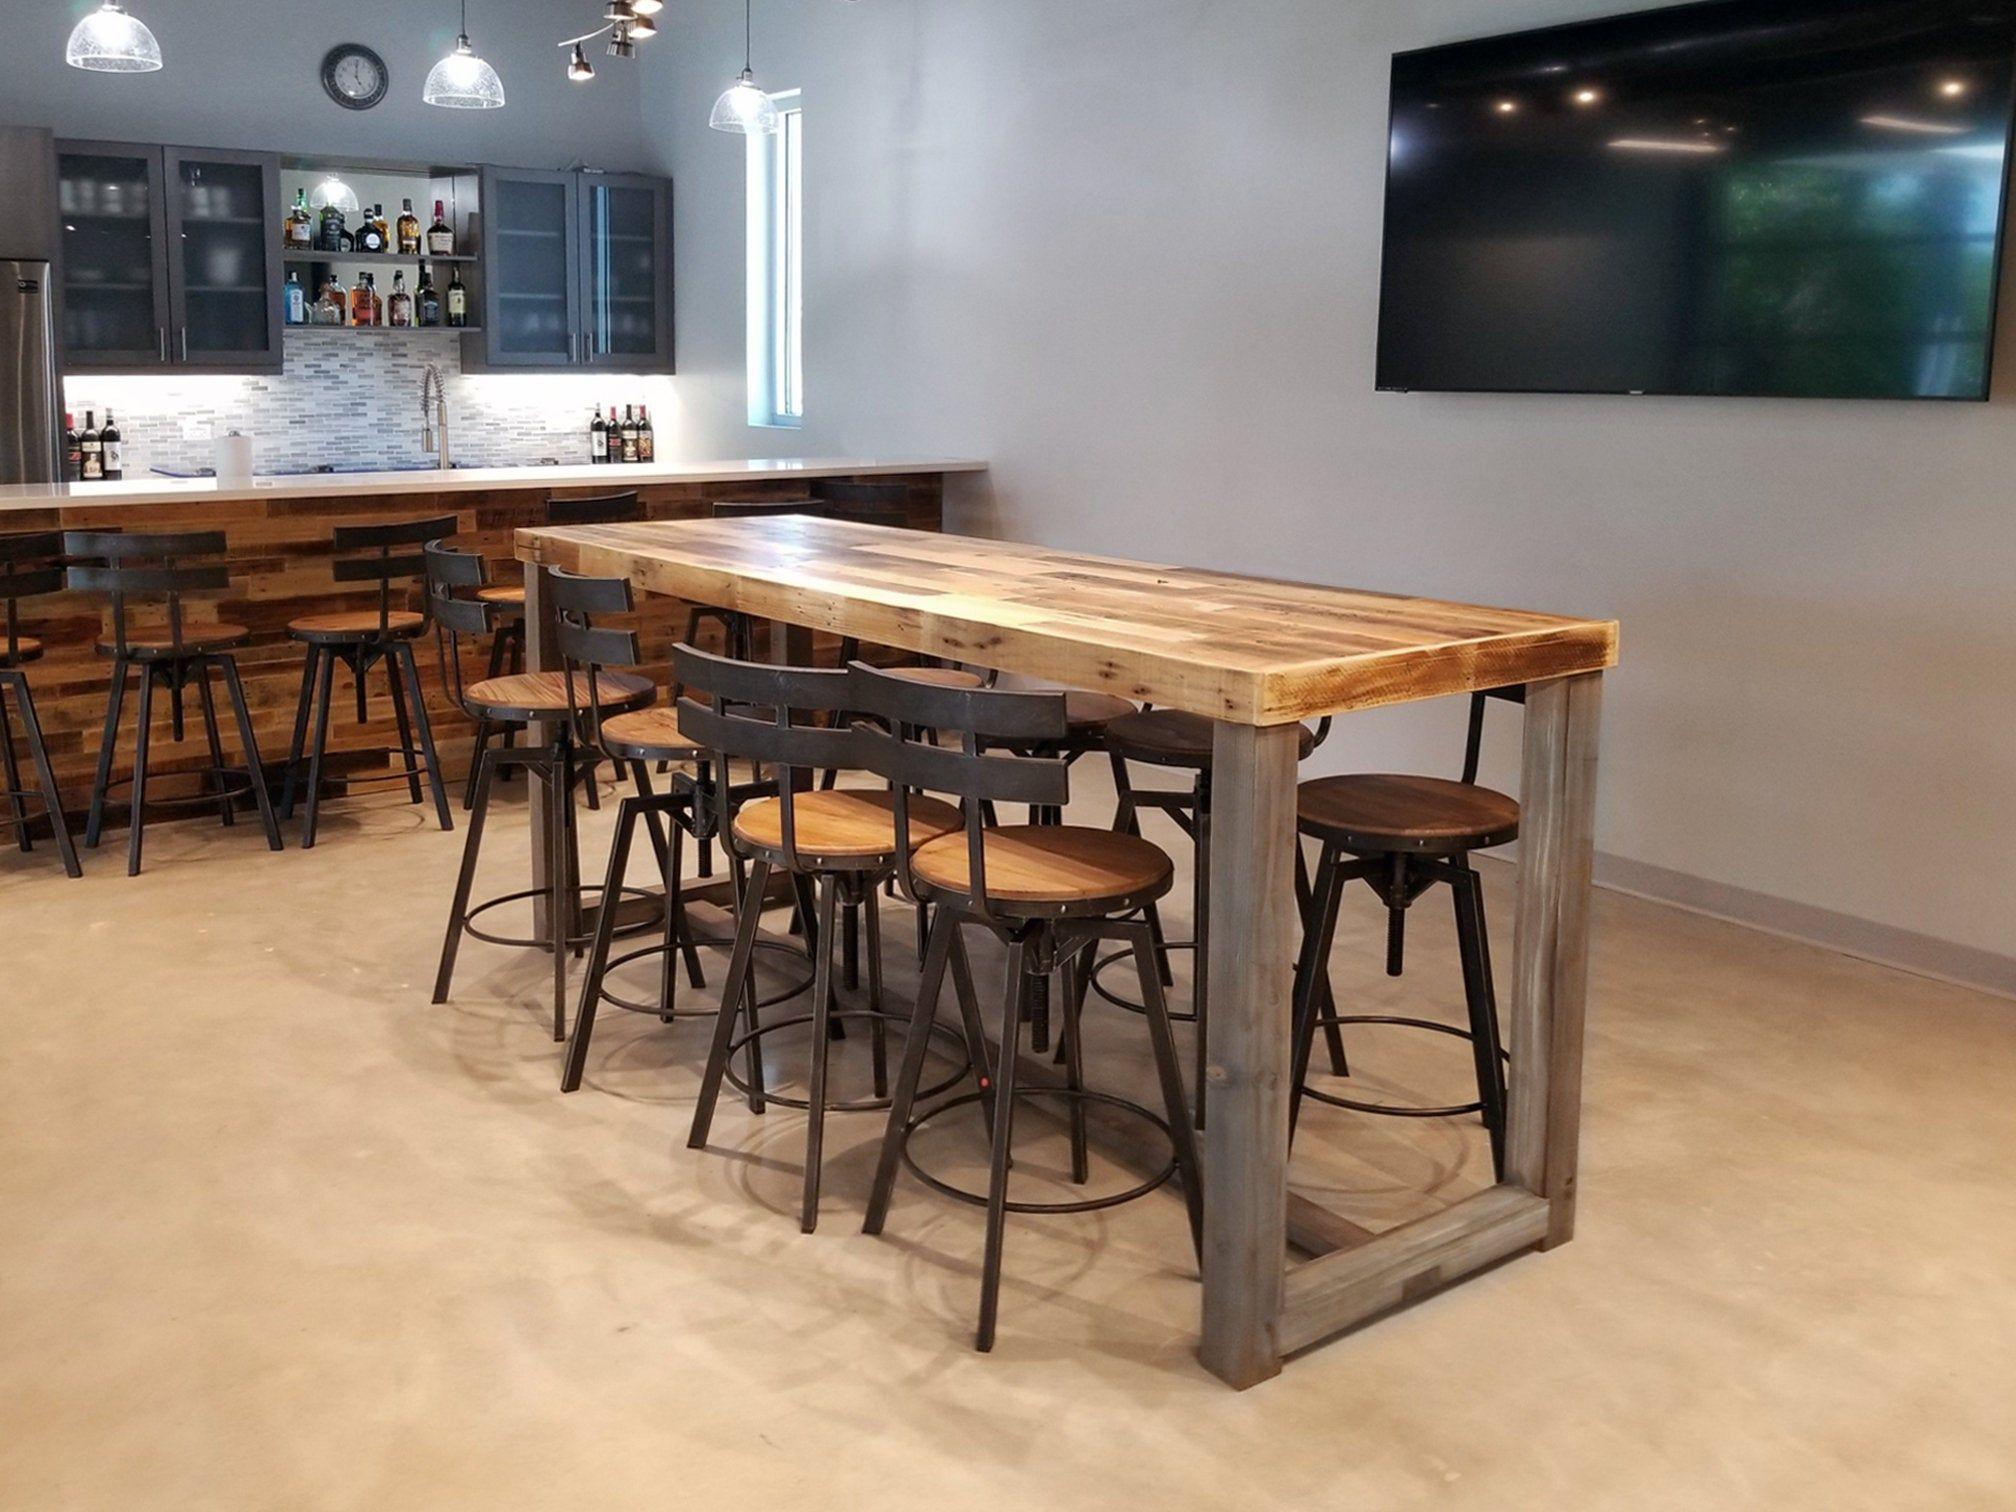 Reclaimed Wood Bar Table Restaurant Counter Community Communal Etsy In 2020 Reclaimed Wood Bars Wood Bar Table Restaurant Counter